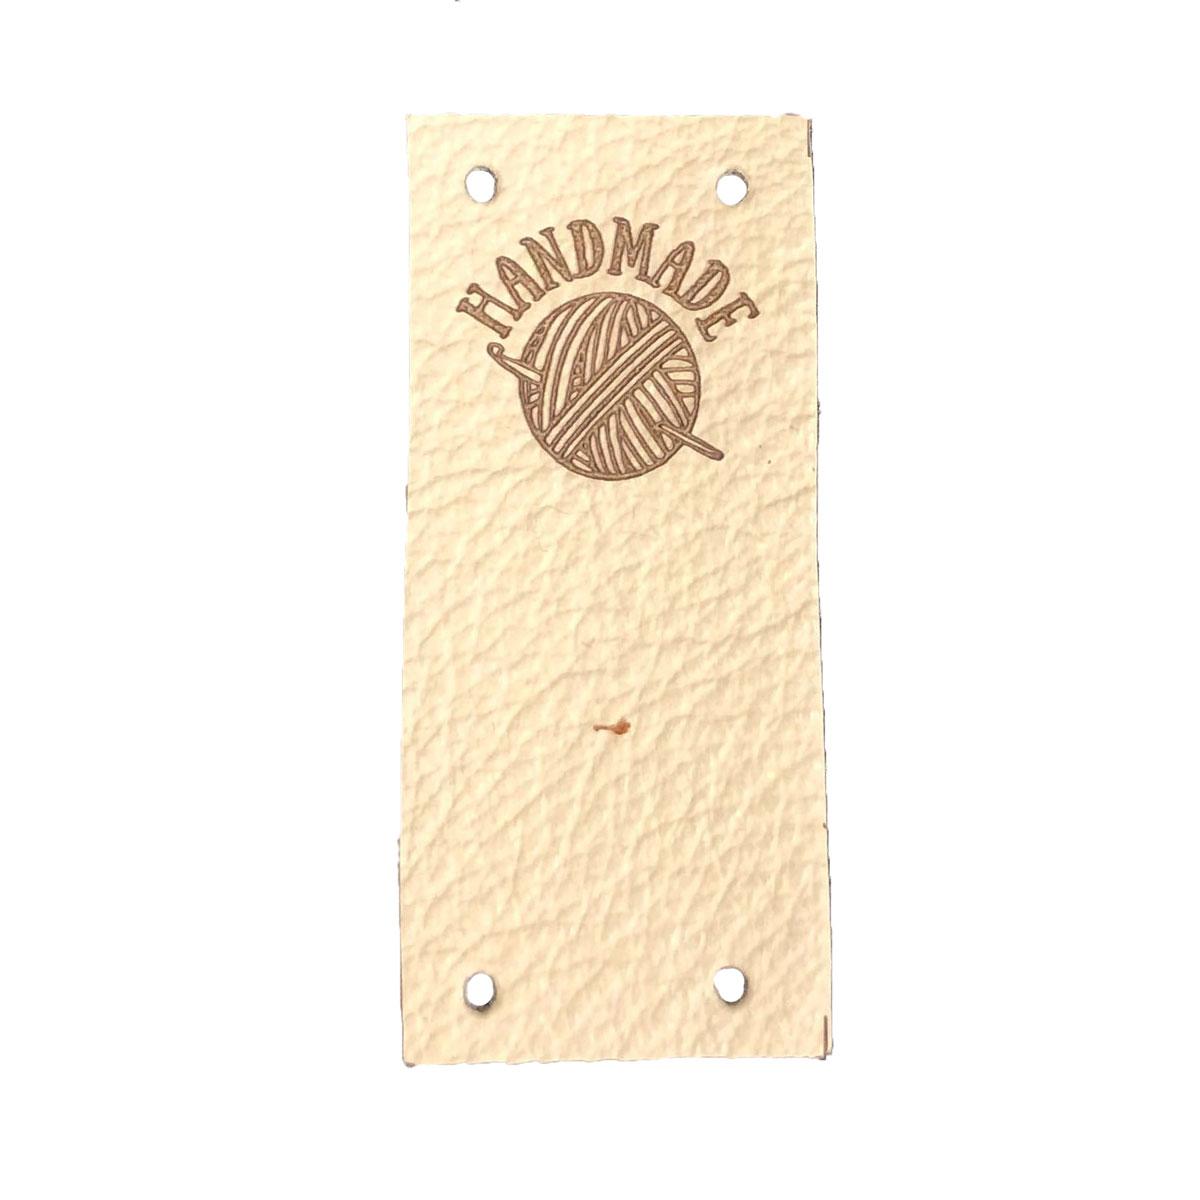 Leather Goods Company Center Fold Leather Label Handmade Crochet